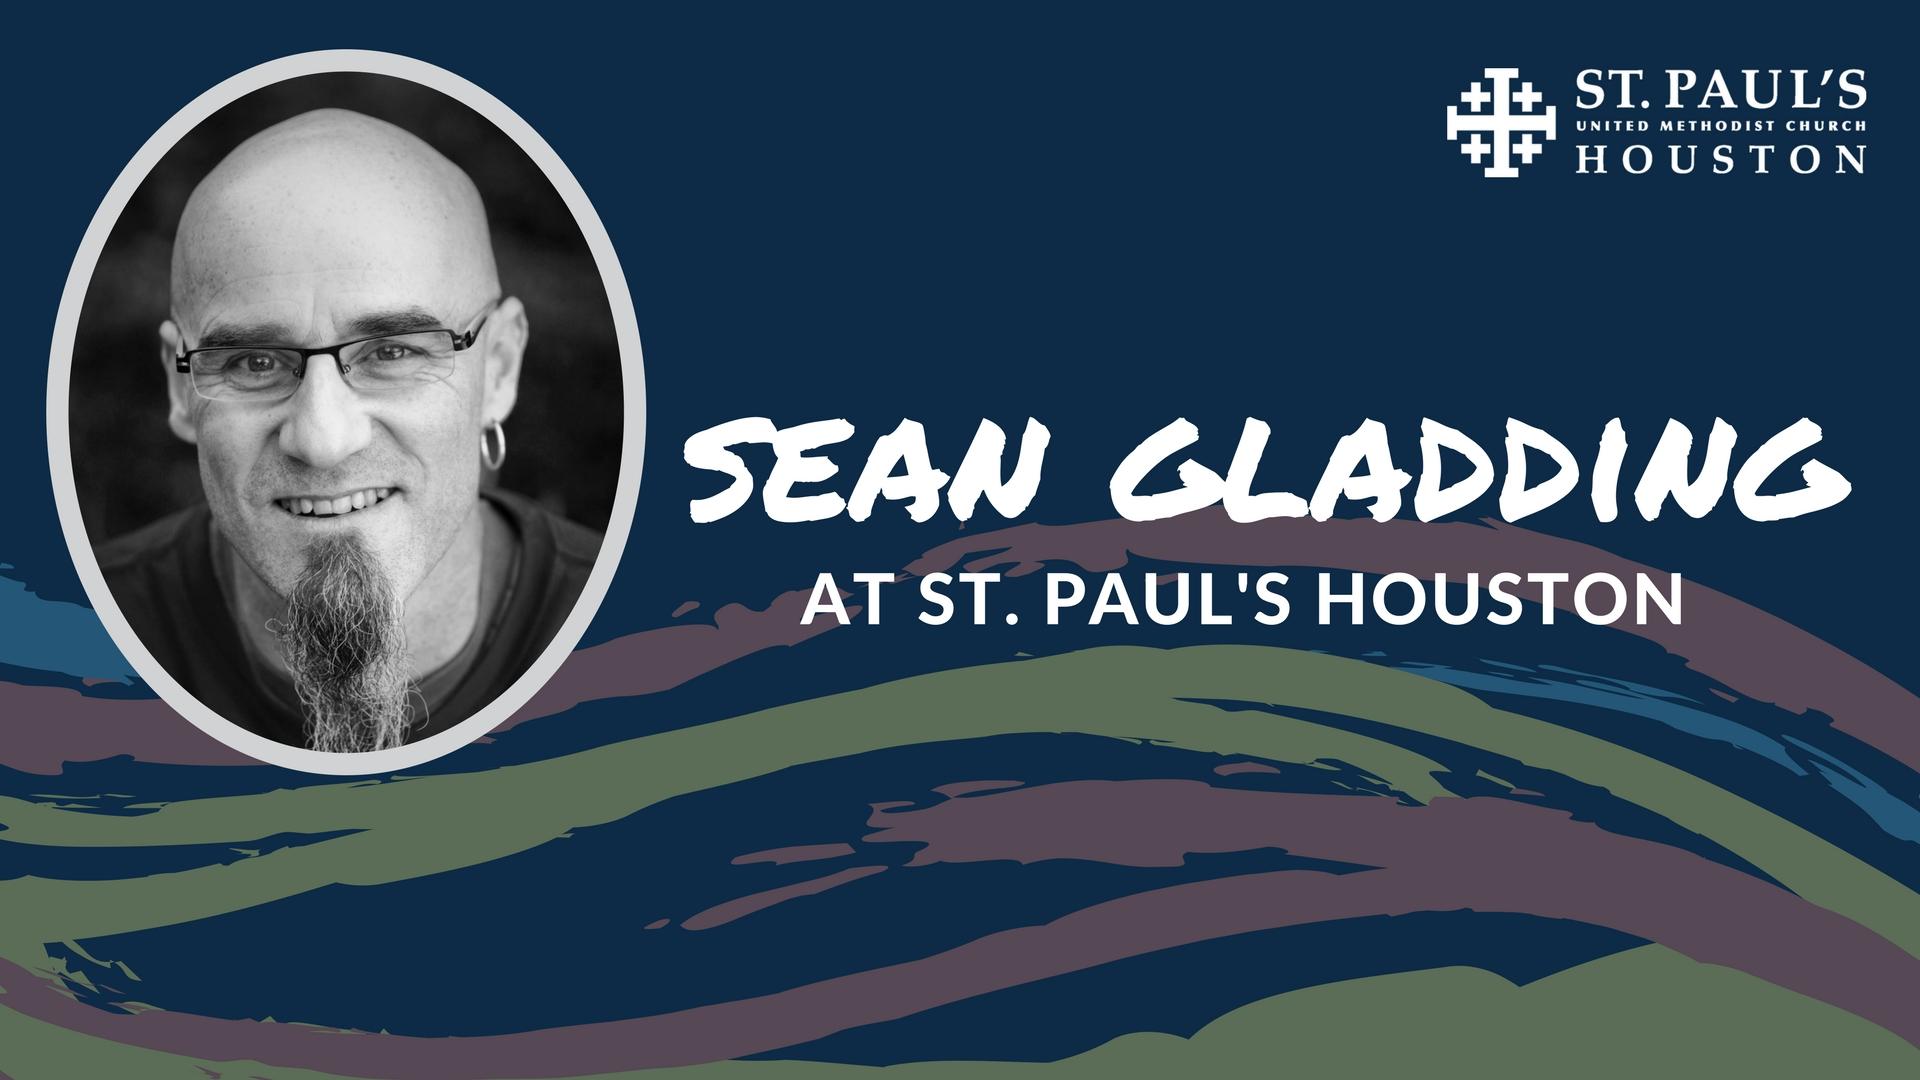 Sean Gladding at St. Paul's.jpg